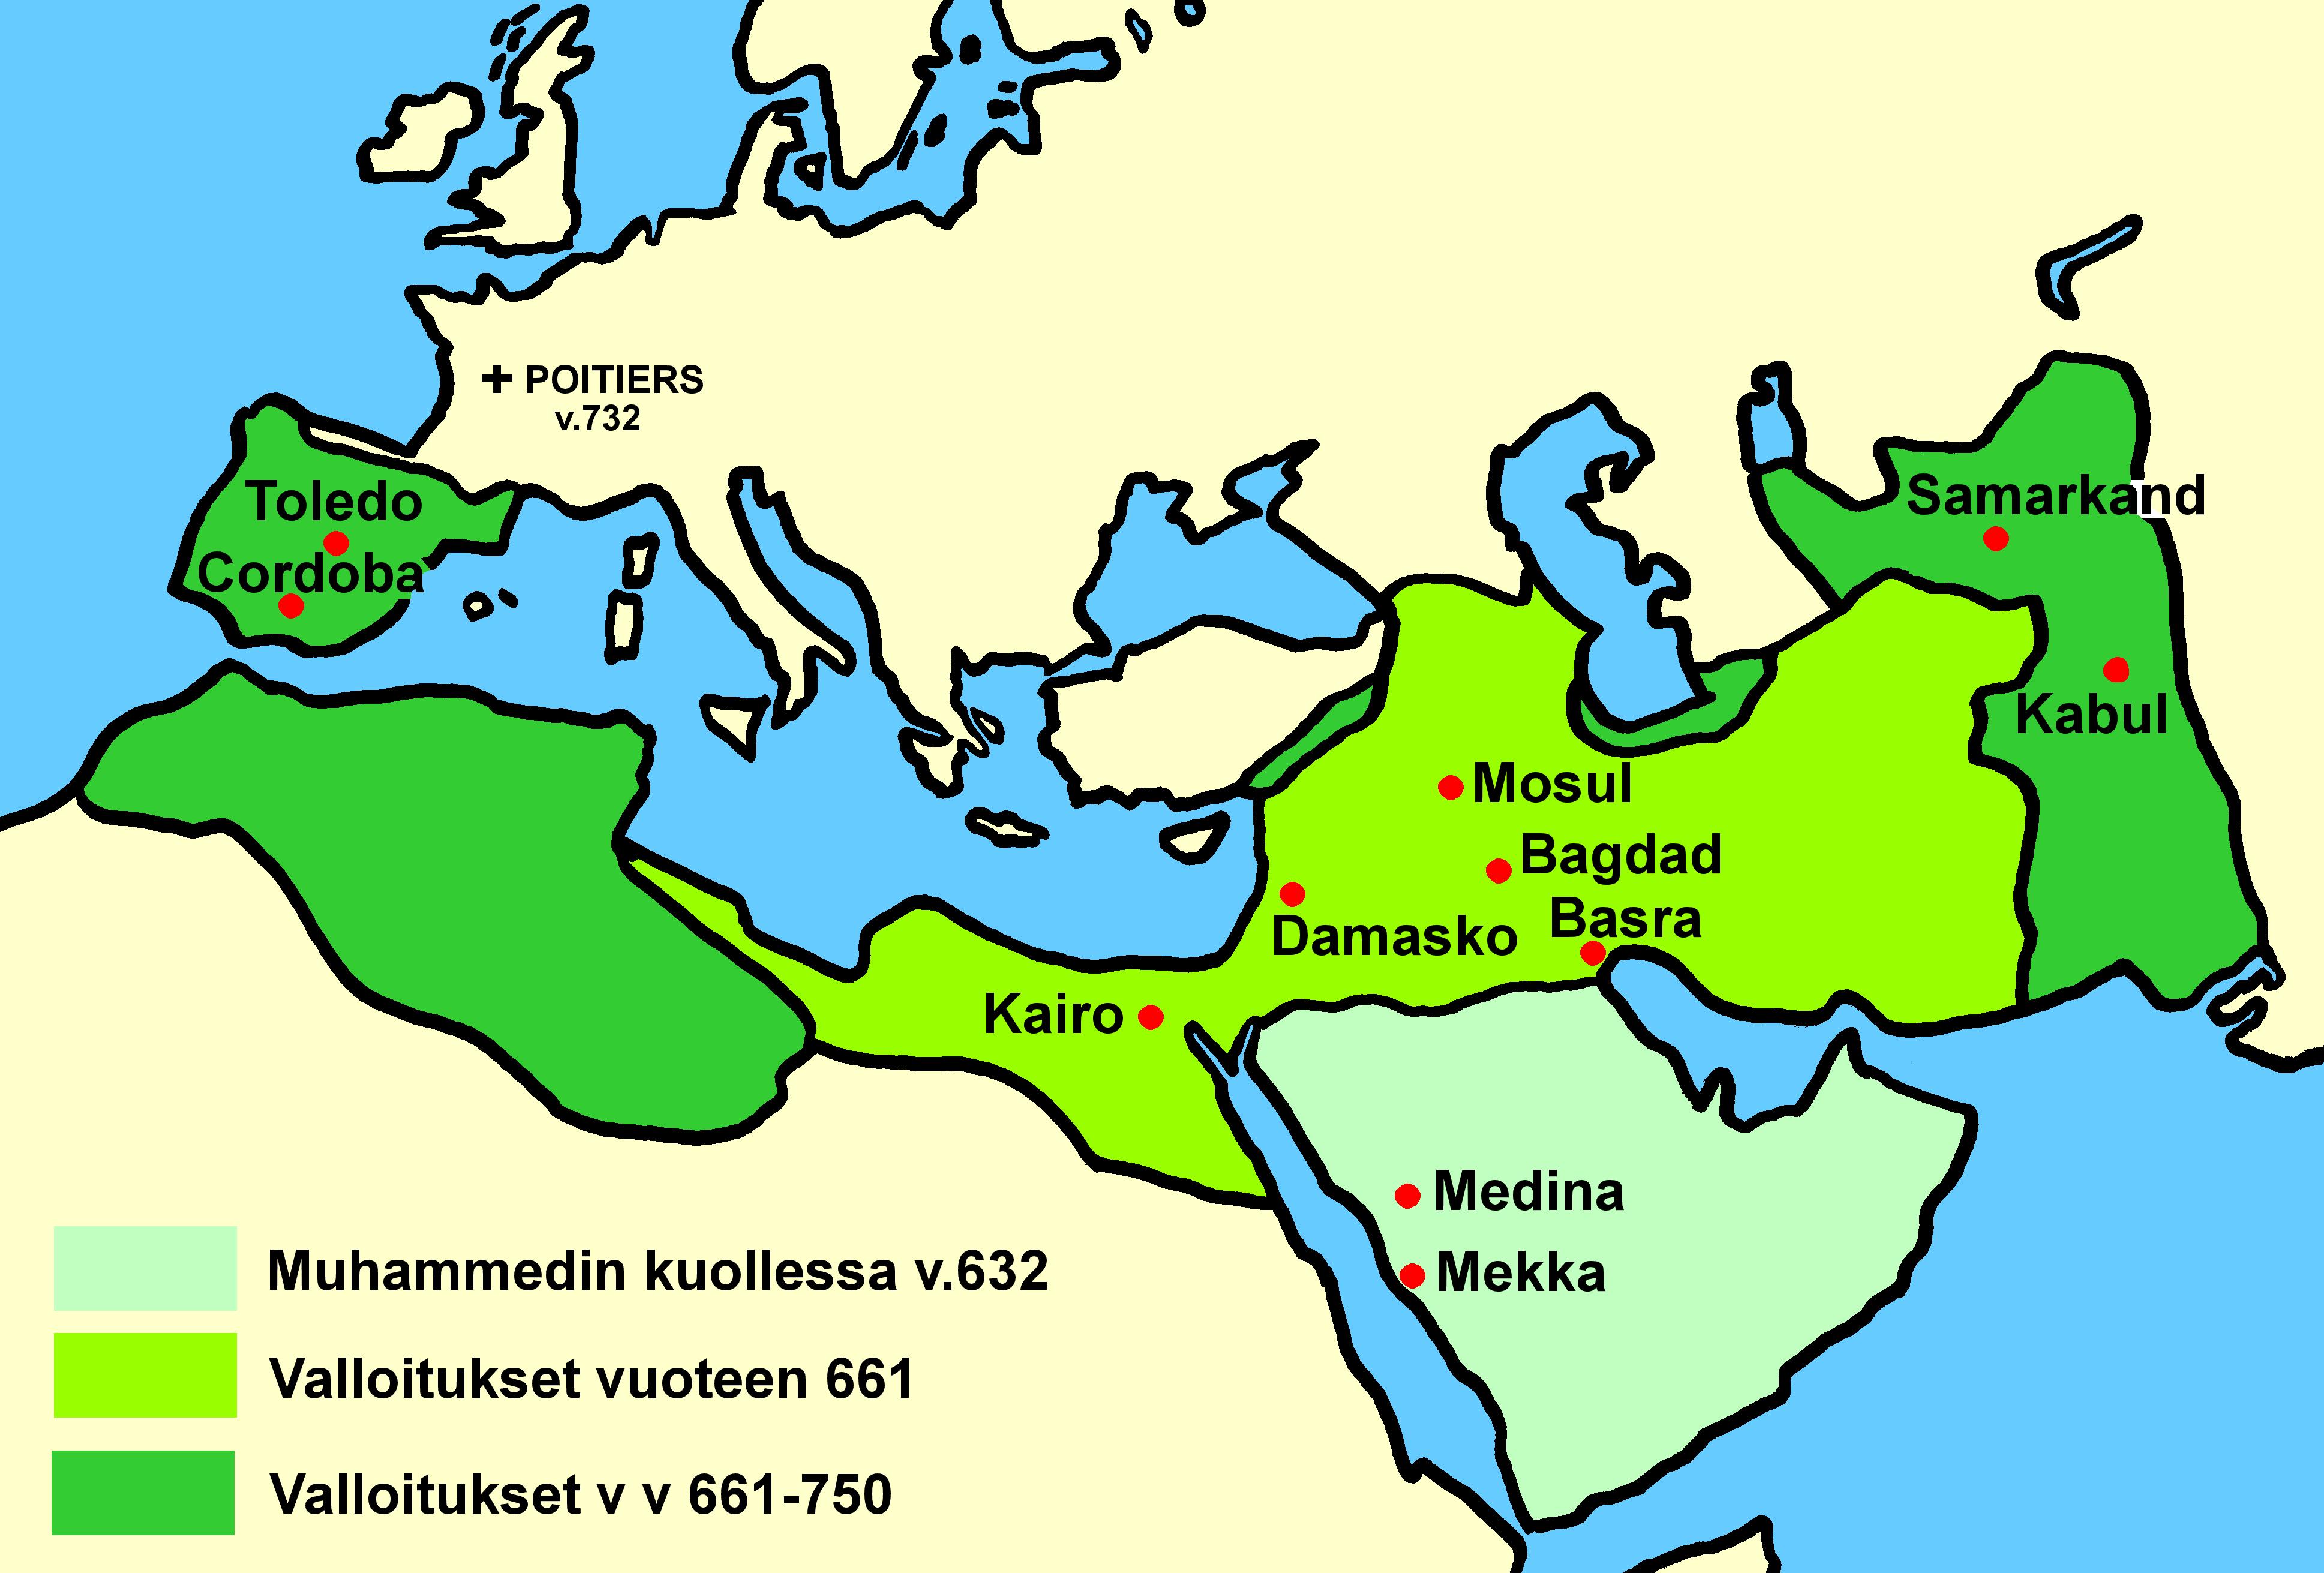 Islamin Levinneisyys